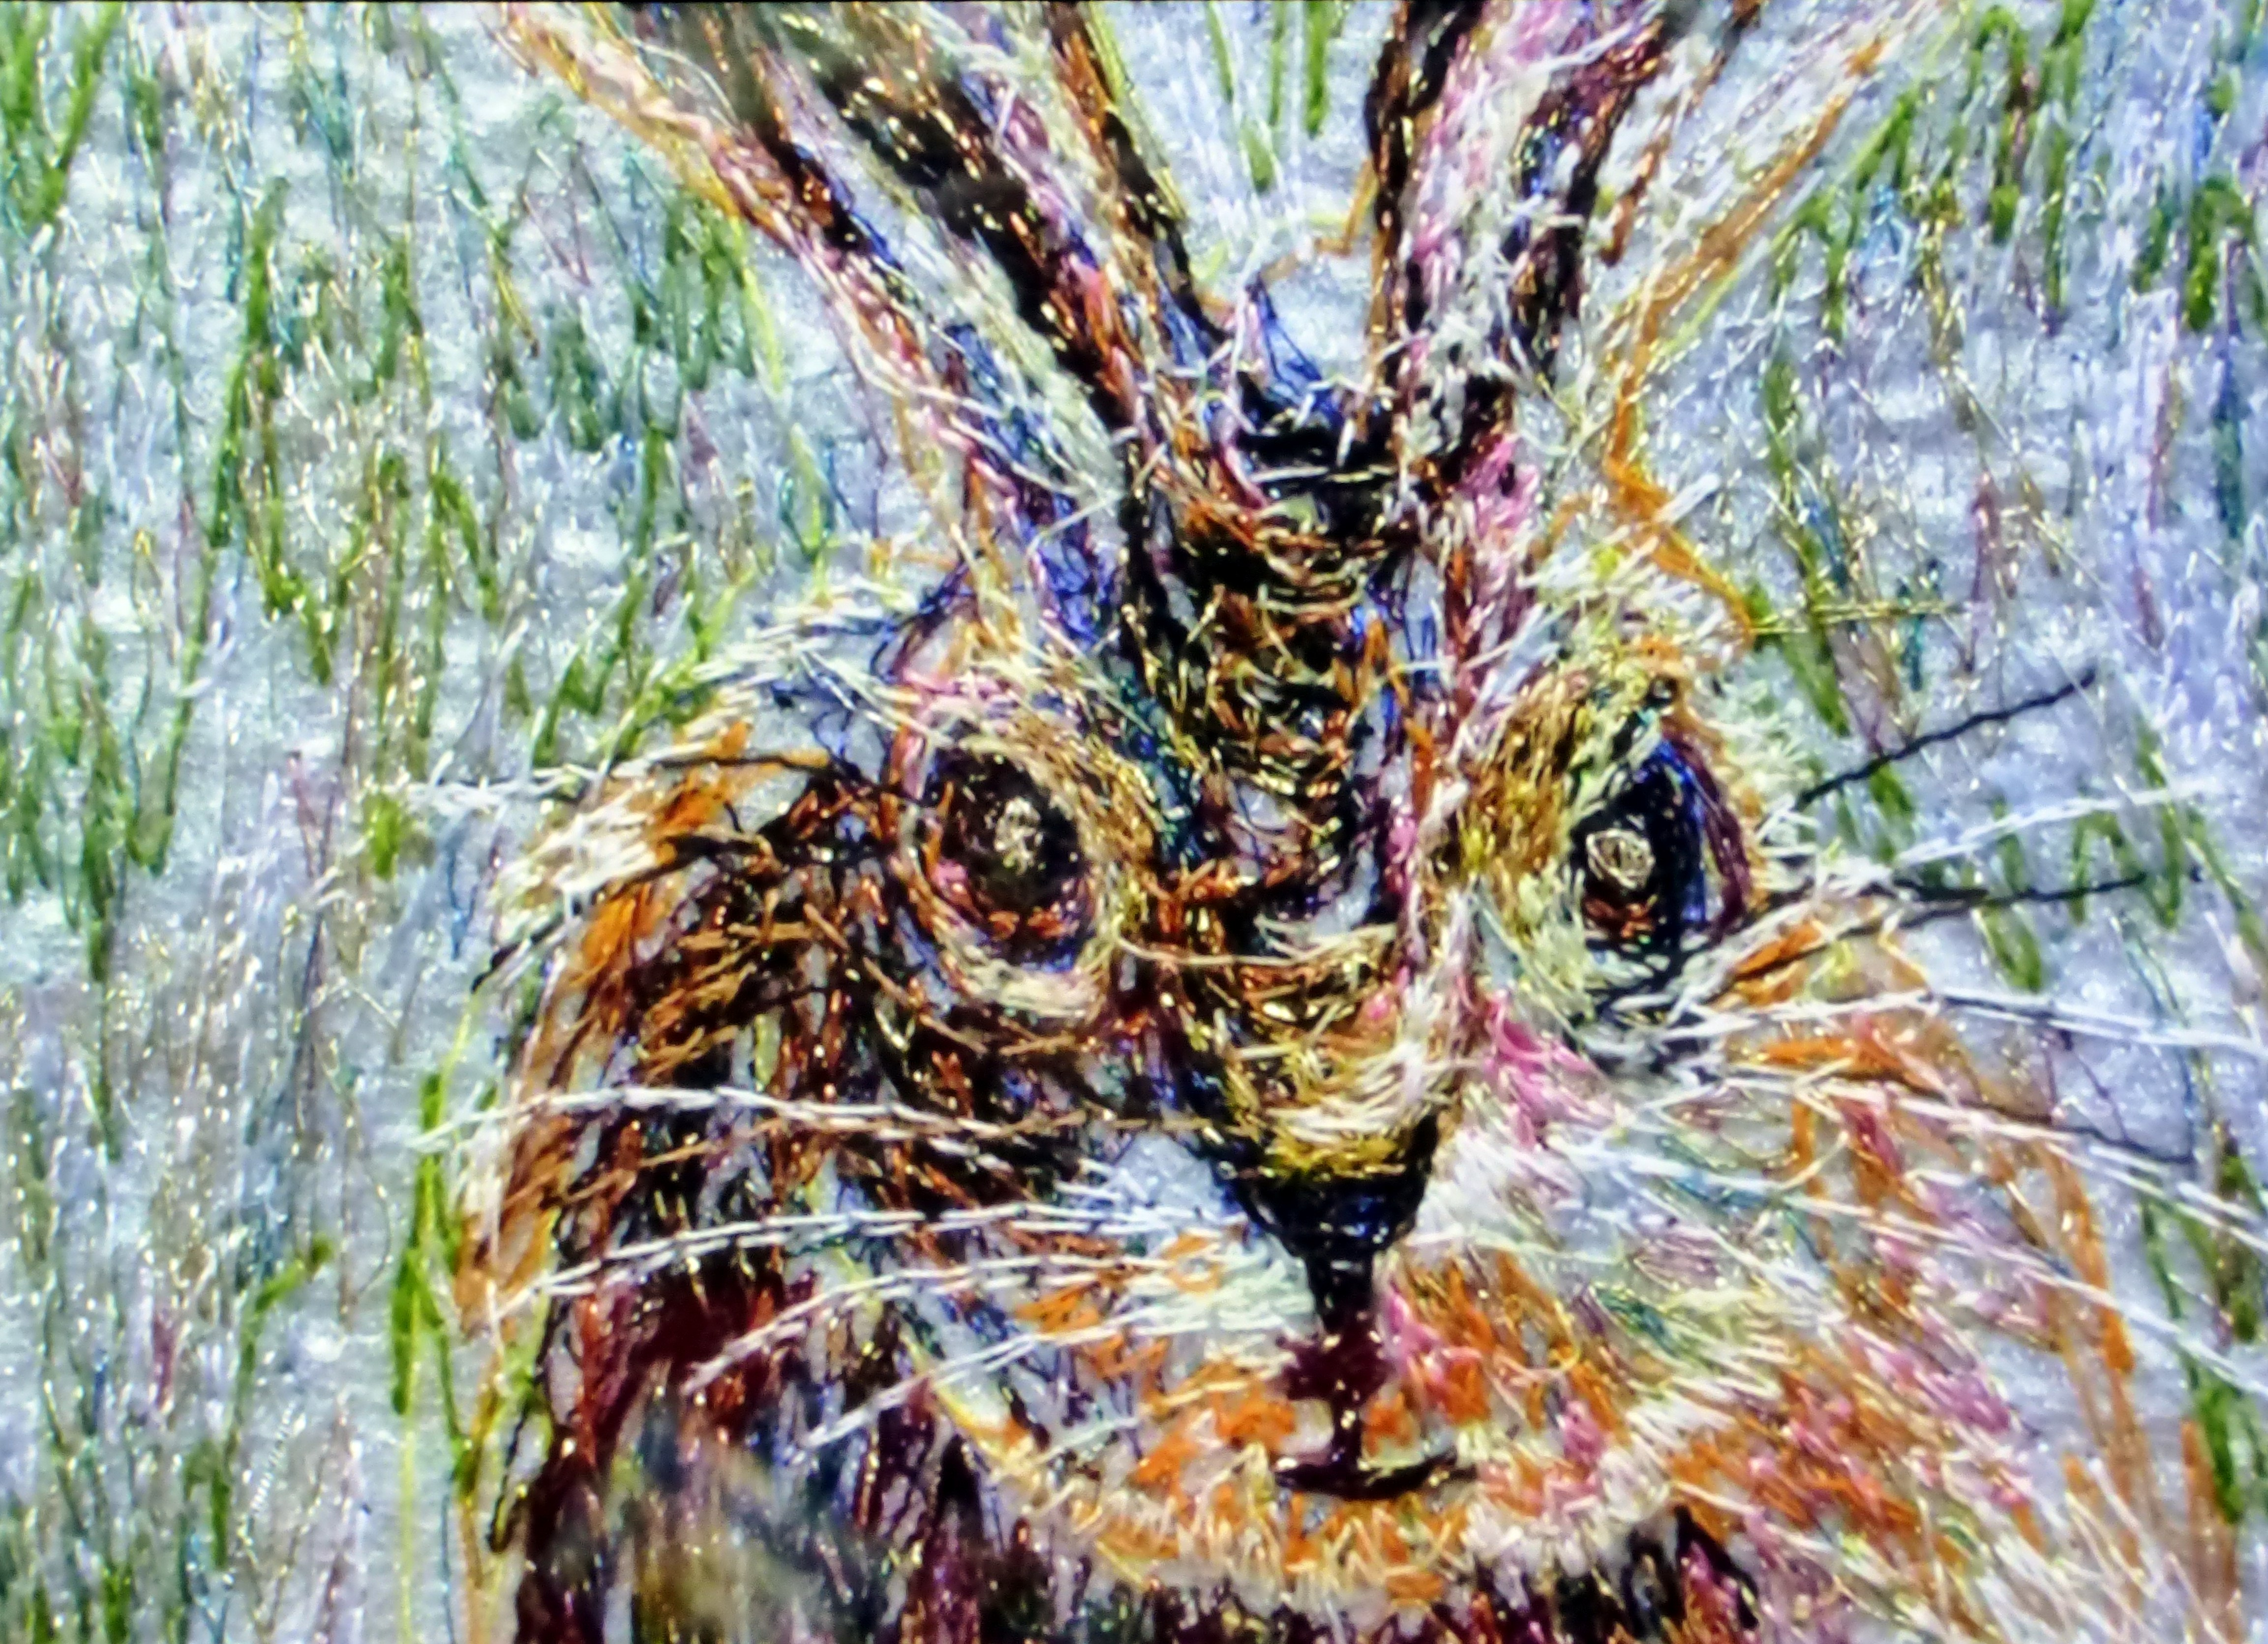 RABBIT embroidery by Richard Box